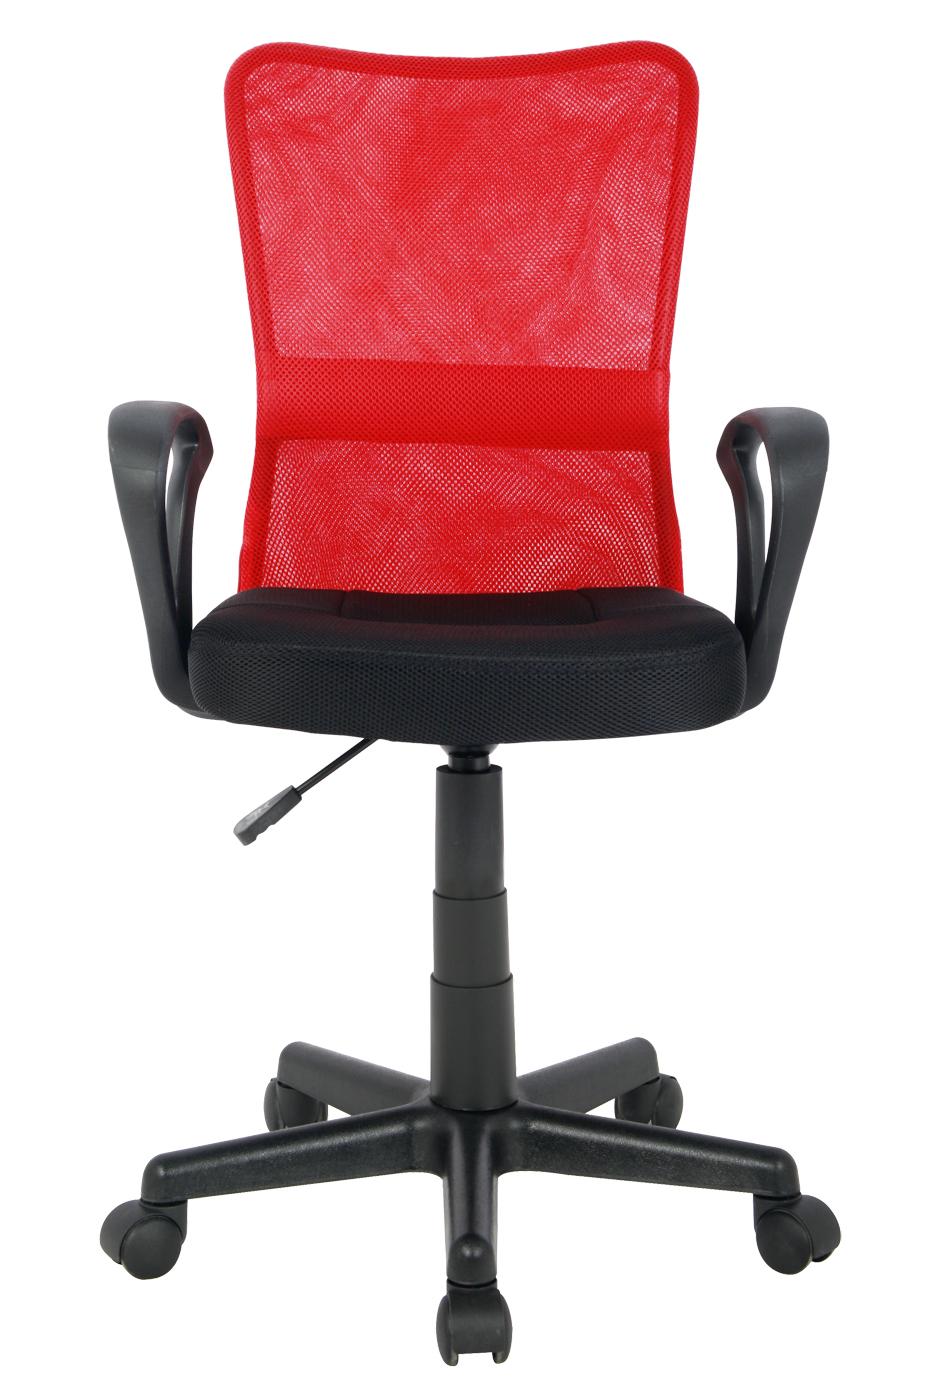 sillas altas de oficina sharemedoc